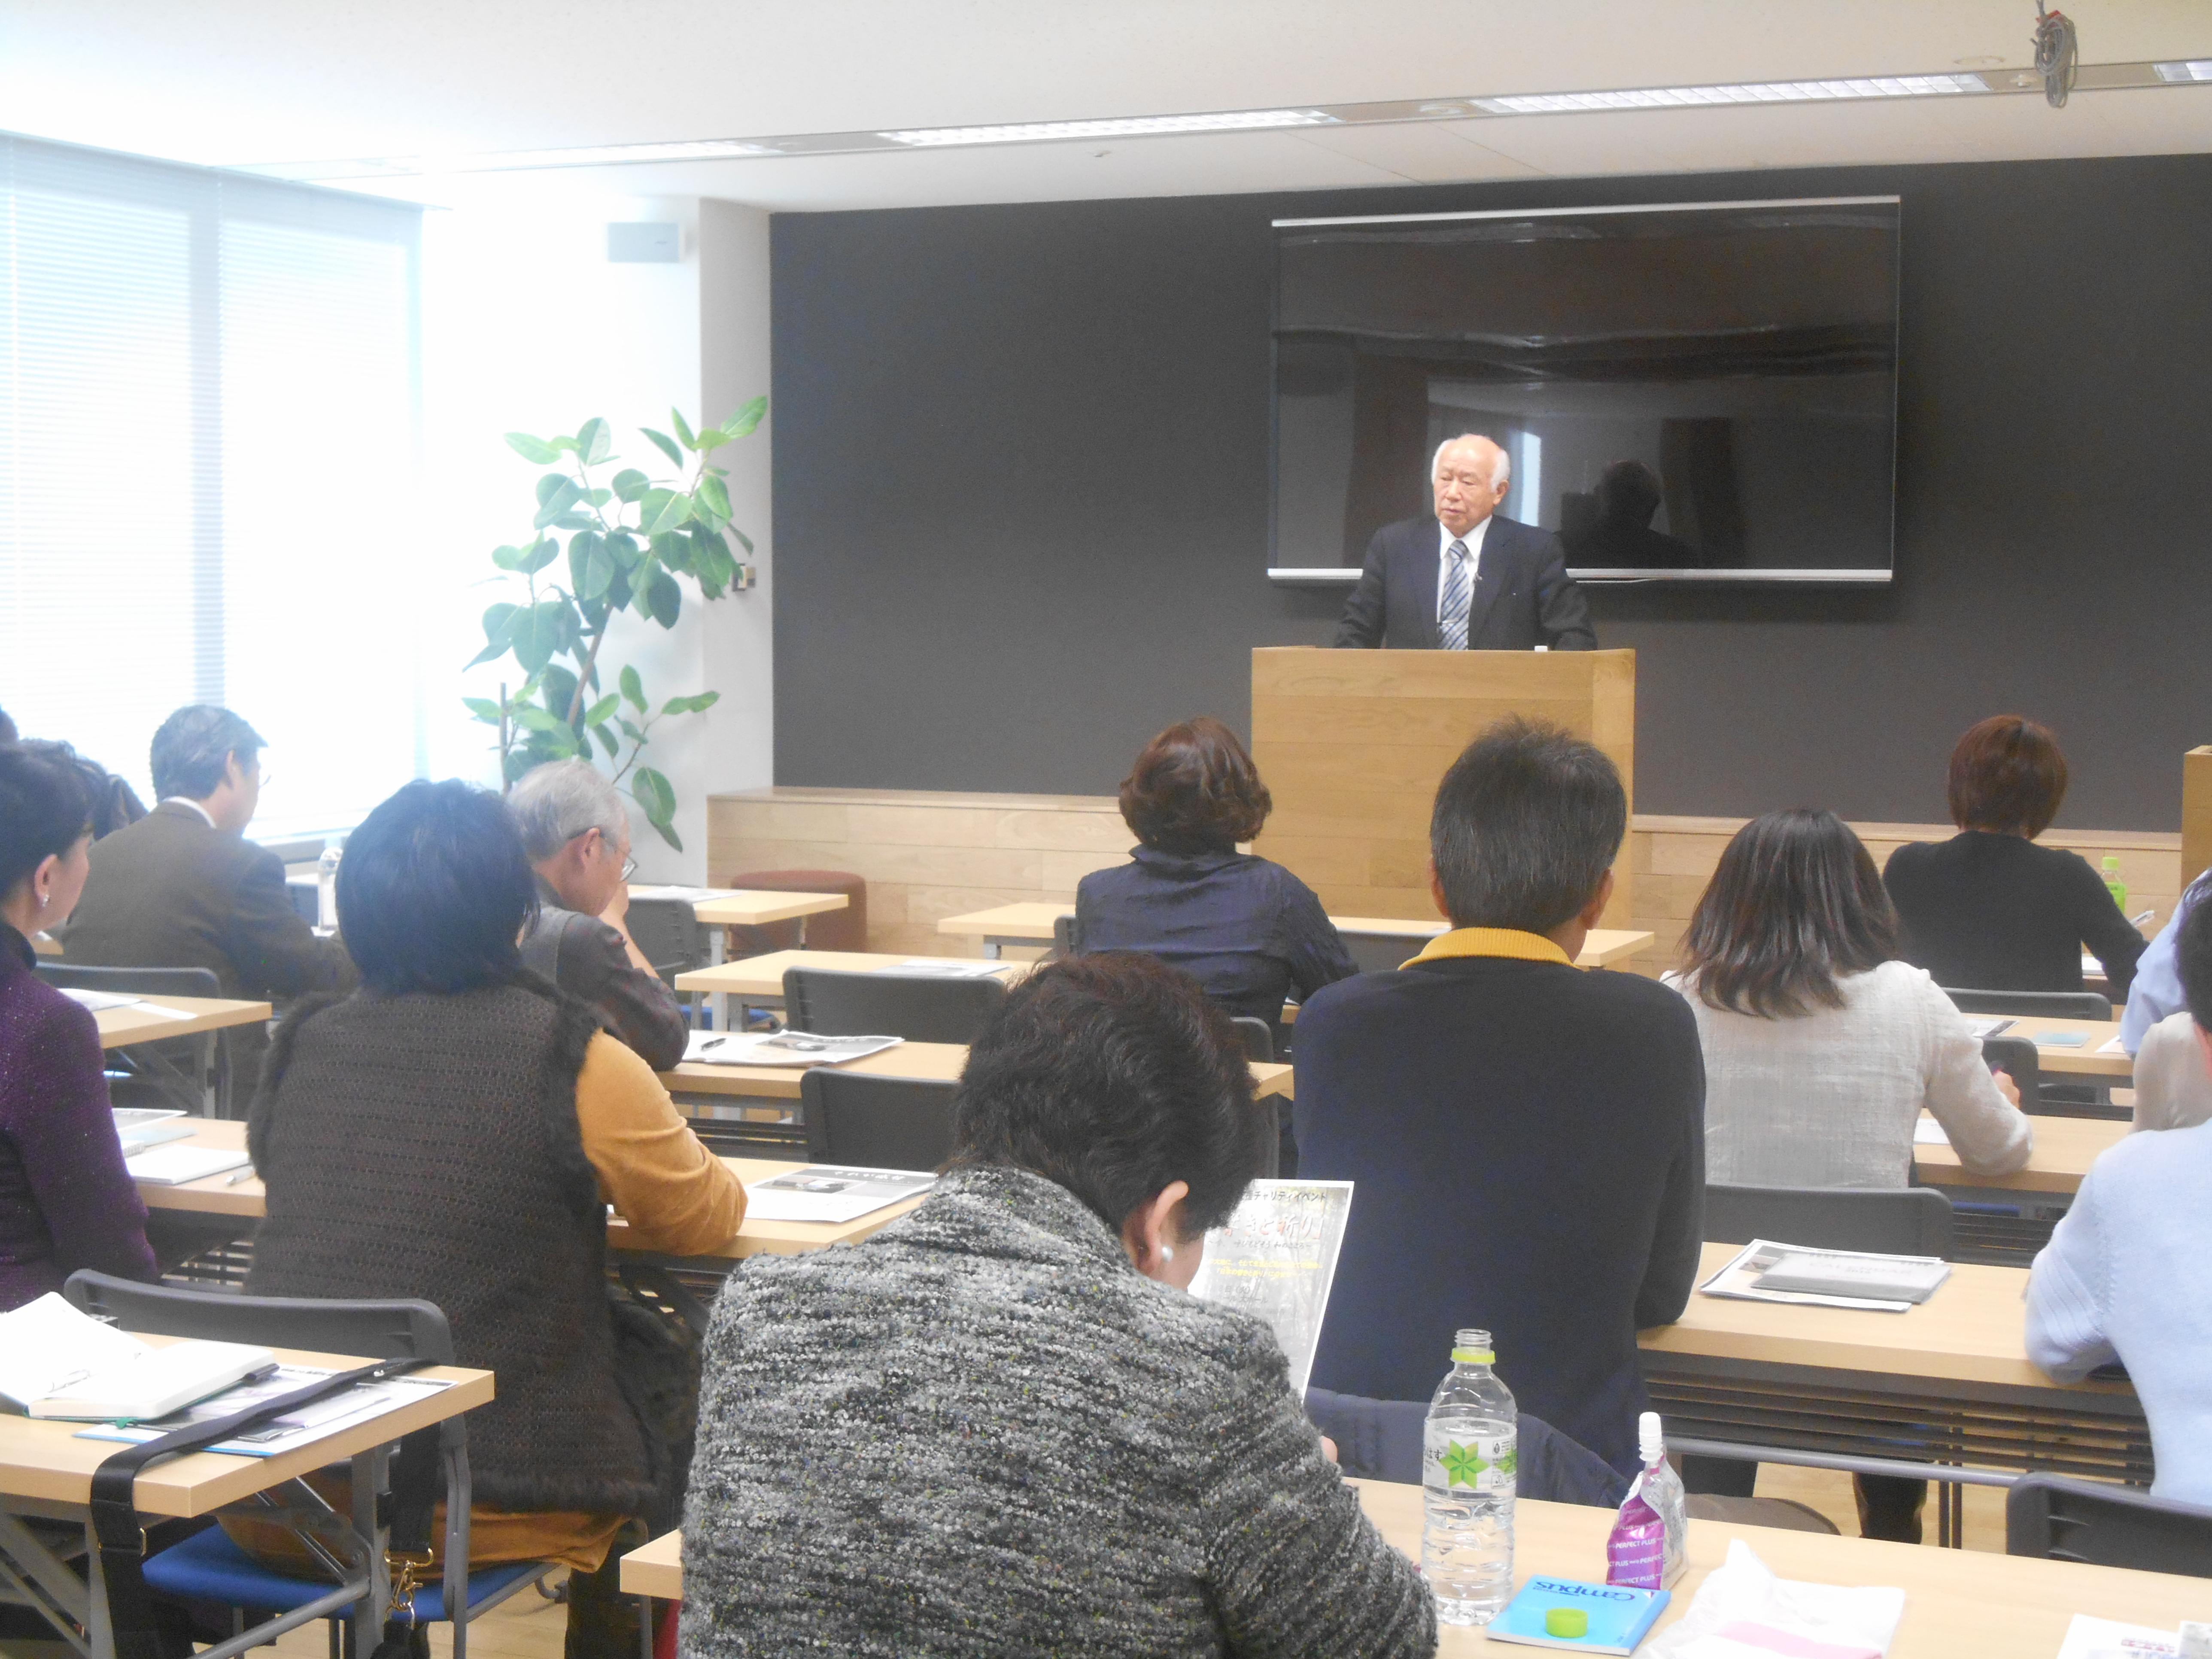 DSCN0434 - 2017年2月4日東京思風塾開催